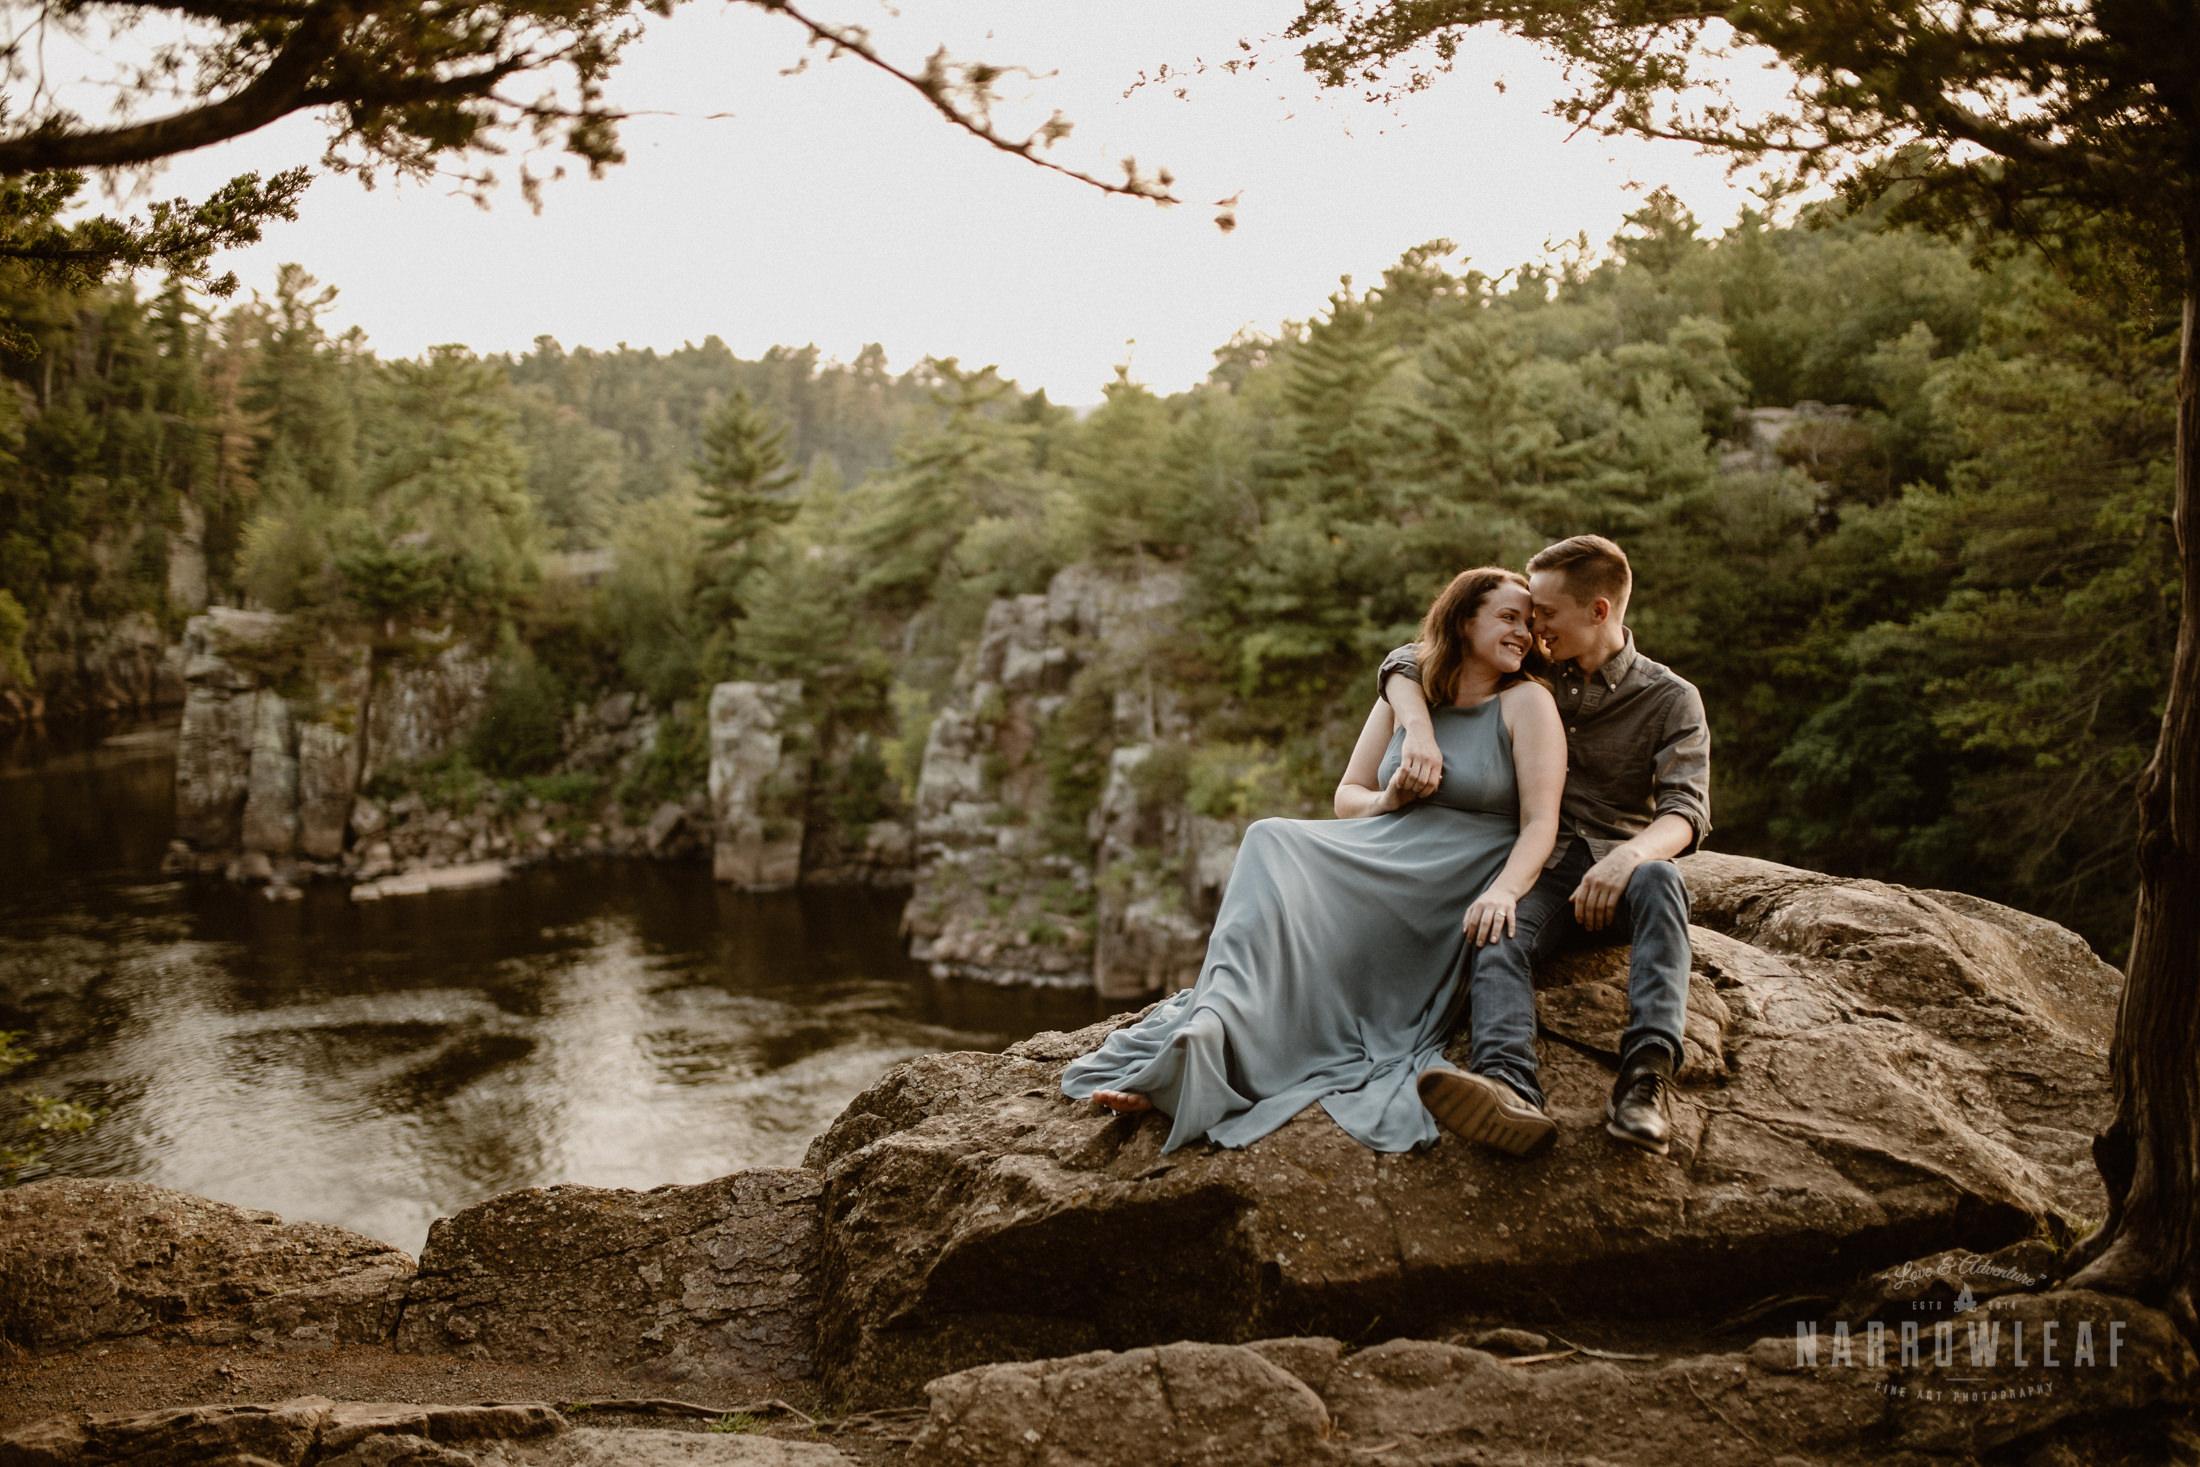 Wisconsin-wedding-adventure-photographer-Narrowleaf_Love_and_Adventure_Photography-1423.jpg